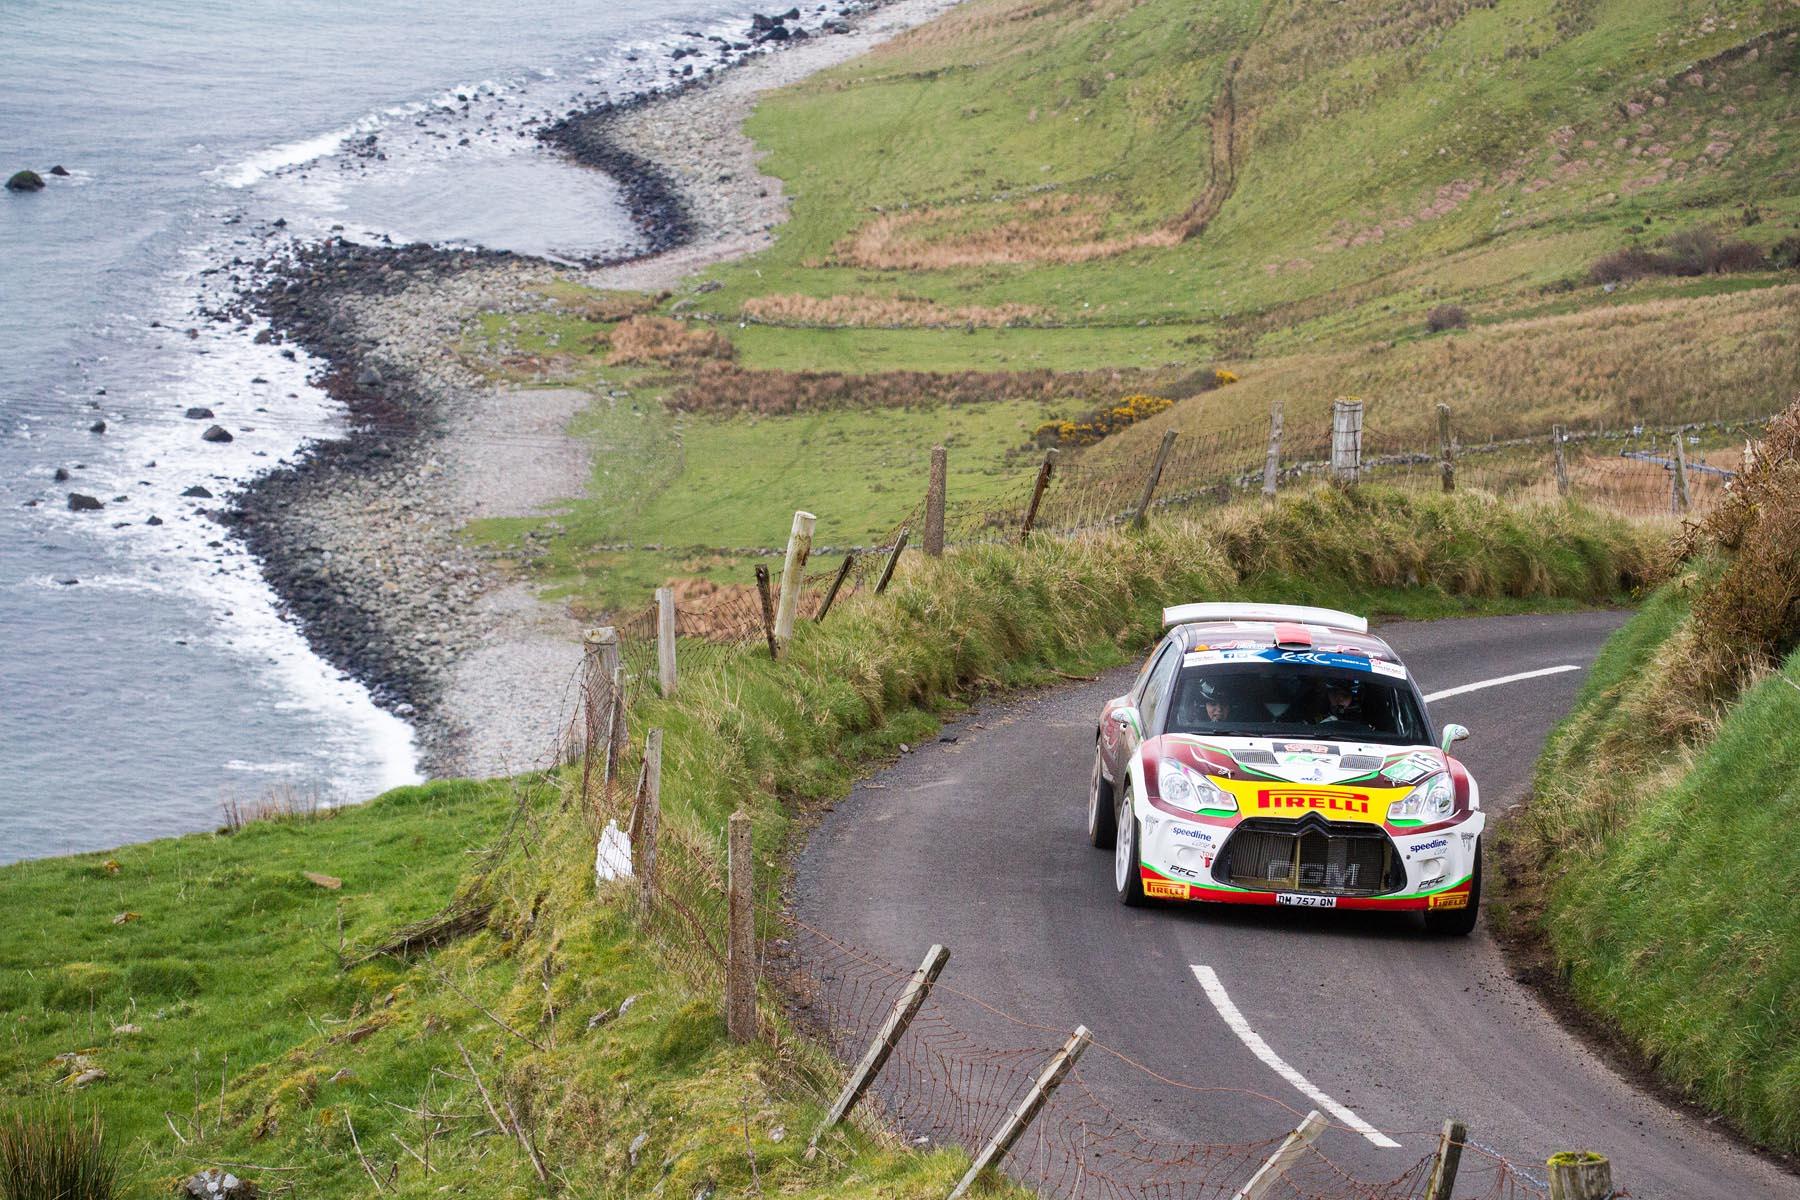 British Rally Championship set for titanic Ulster Tarmac tussle ...